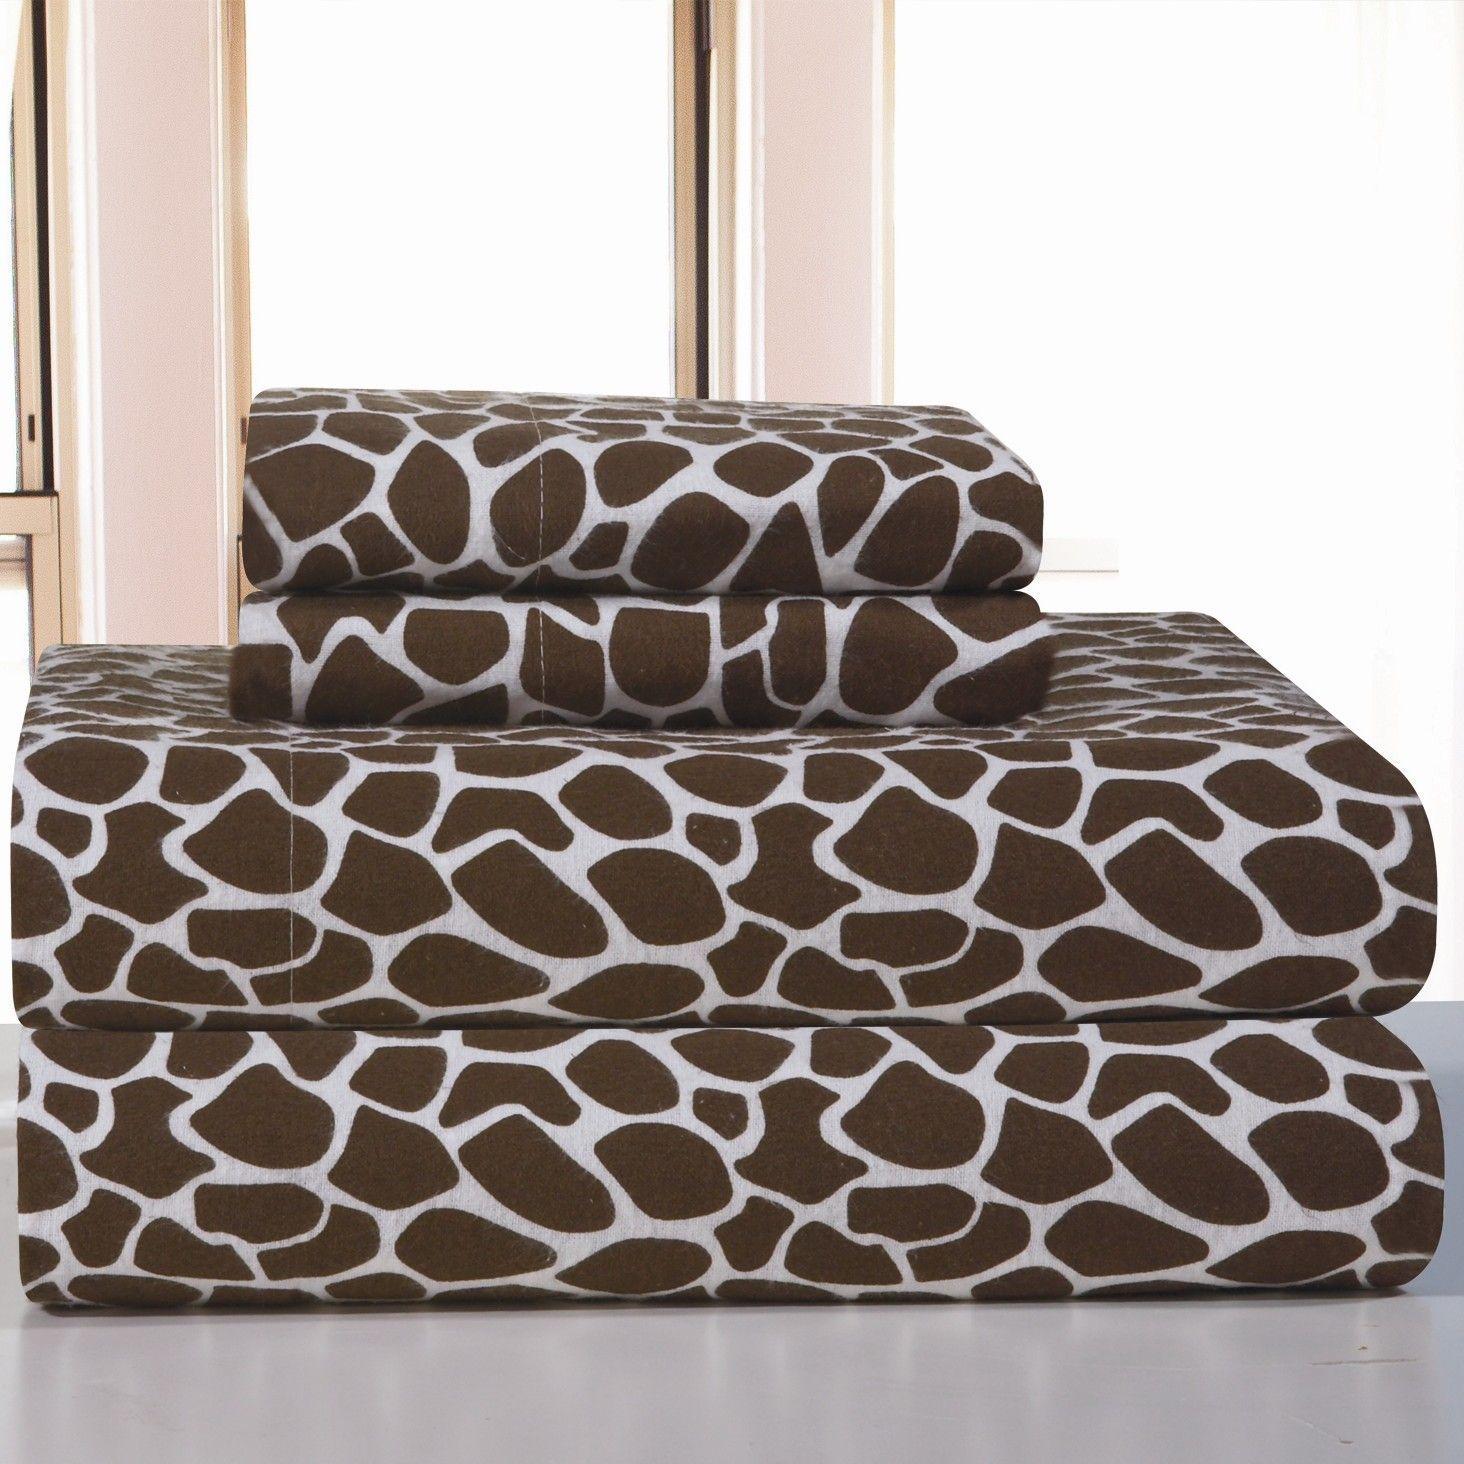 Heavy Weight Giraffe Animal Print Cotton Flannel Sheet Set Giraffe Bedding Flannel Bed Sheets Flannel Bedding